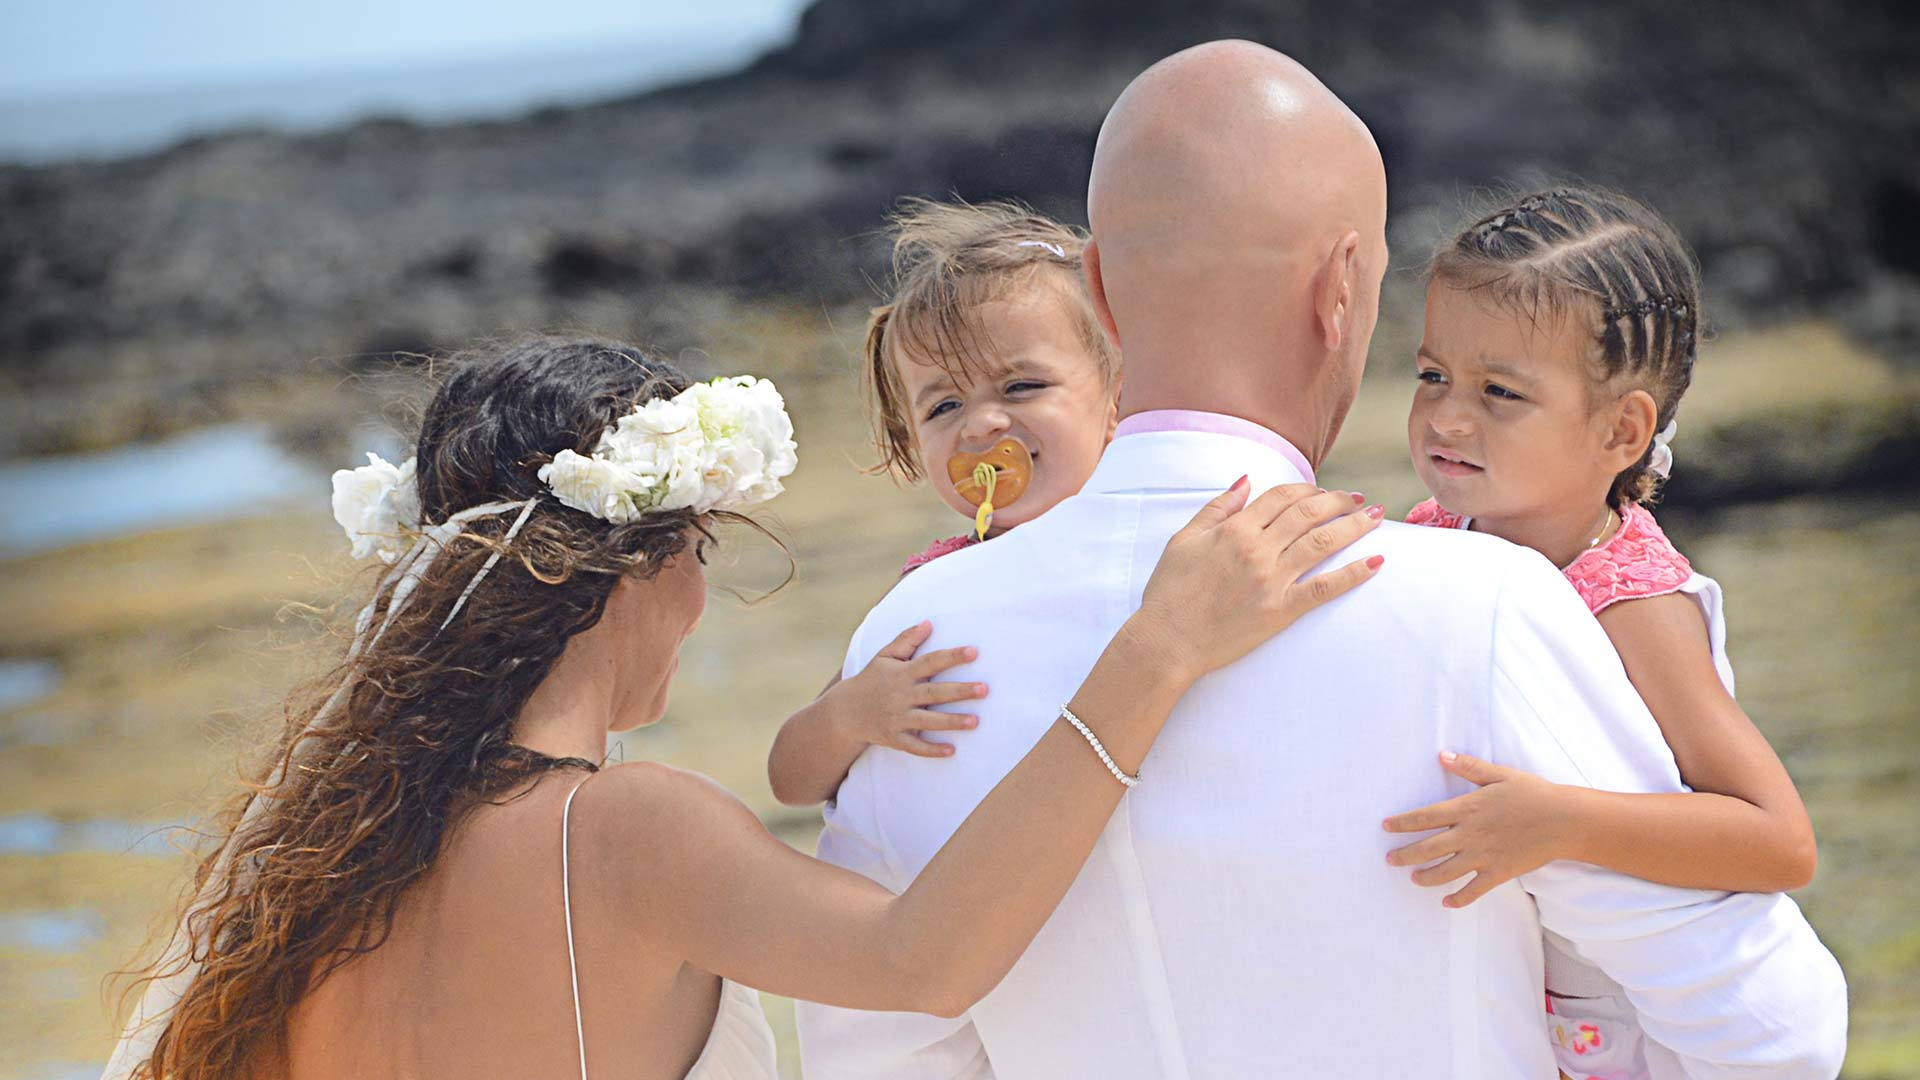 Matrimonio Simbolico Genova : Matrimonio simbolico a nosy fanihy